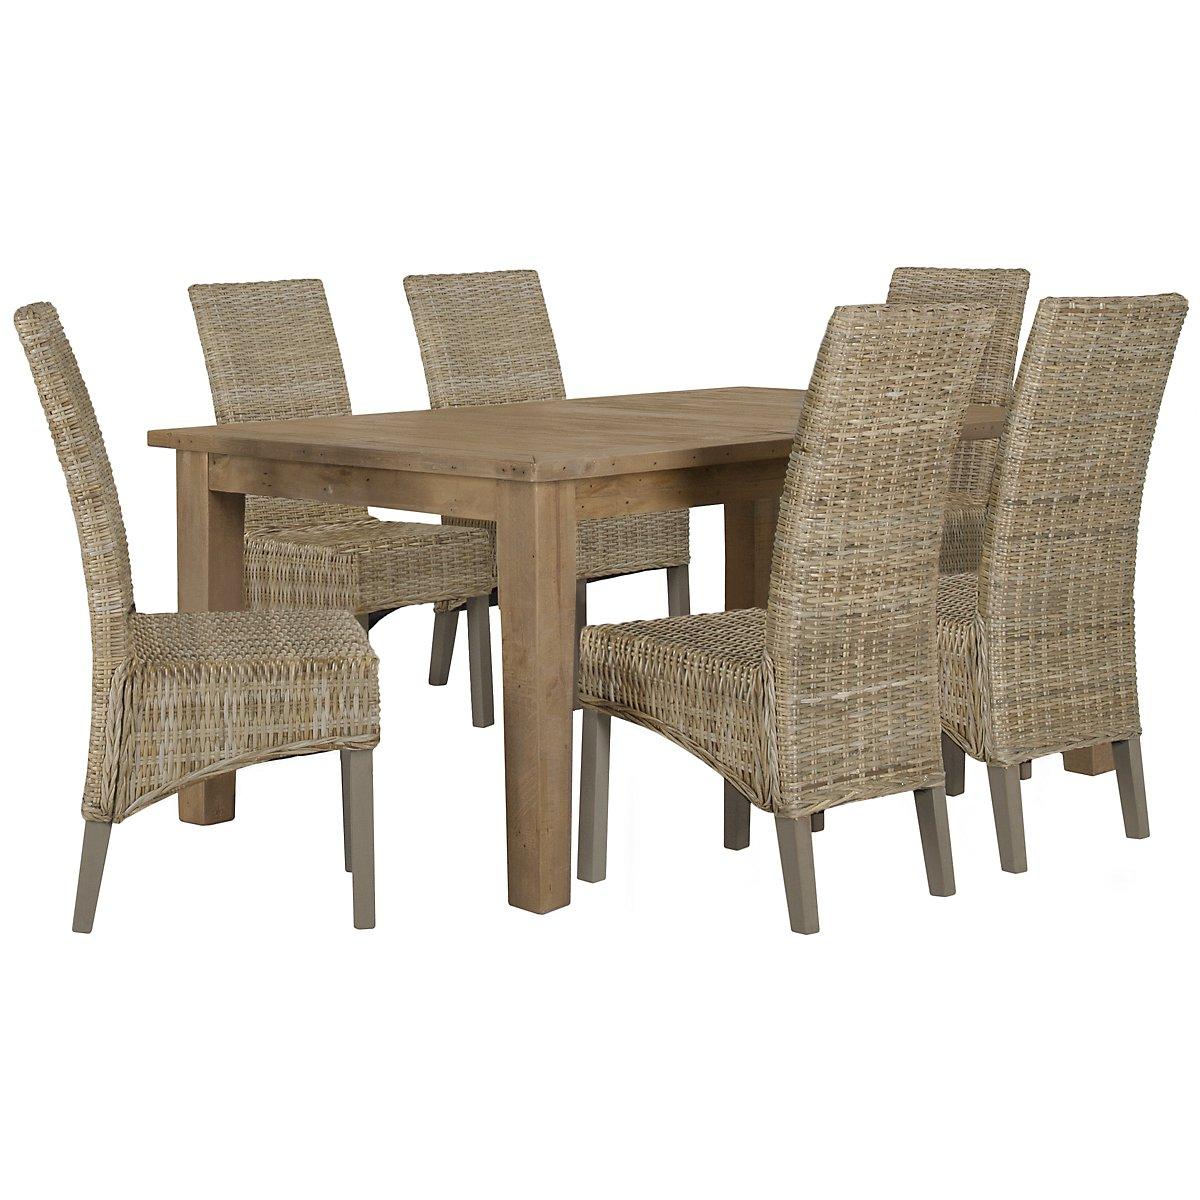 Jaden Light Tone Rectangular Table & 4 Woven Chairs